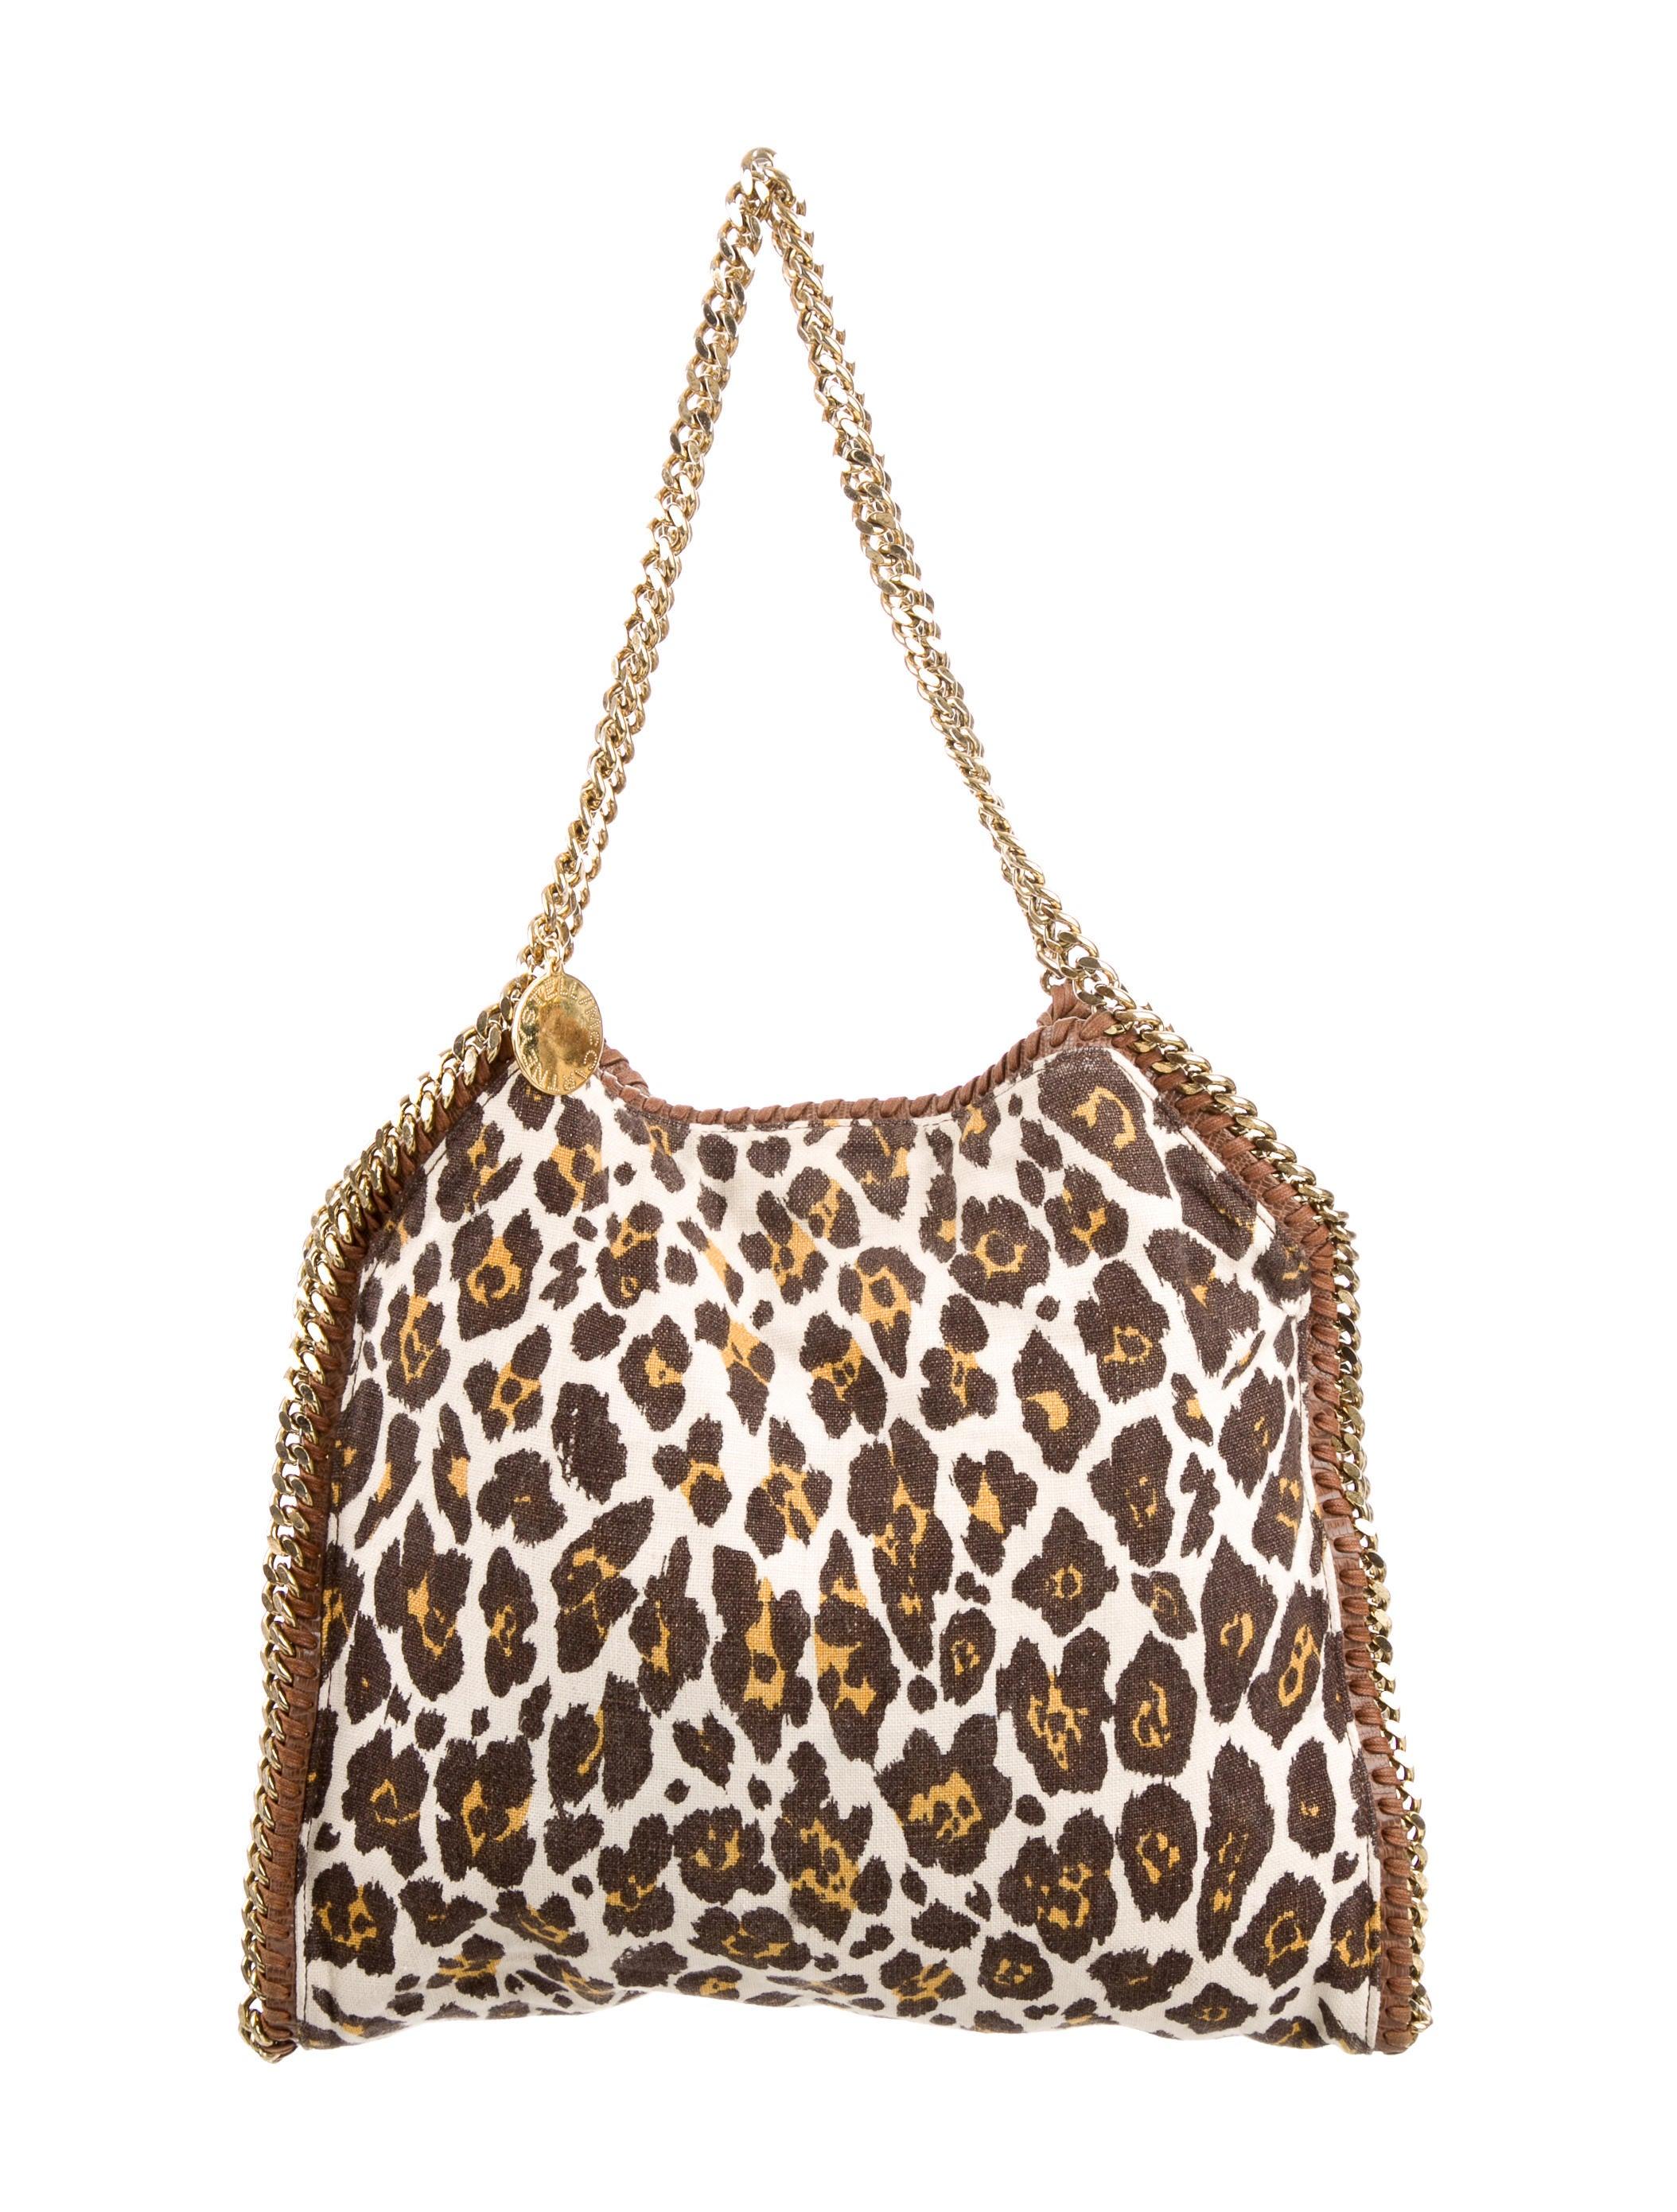 cf78269dc063 Stella McCartney Small Falabella Leopard Print Tote - Handbags ...